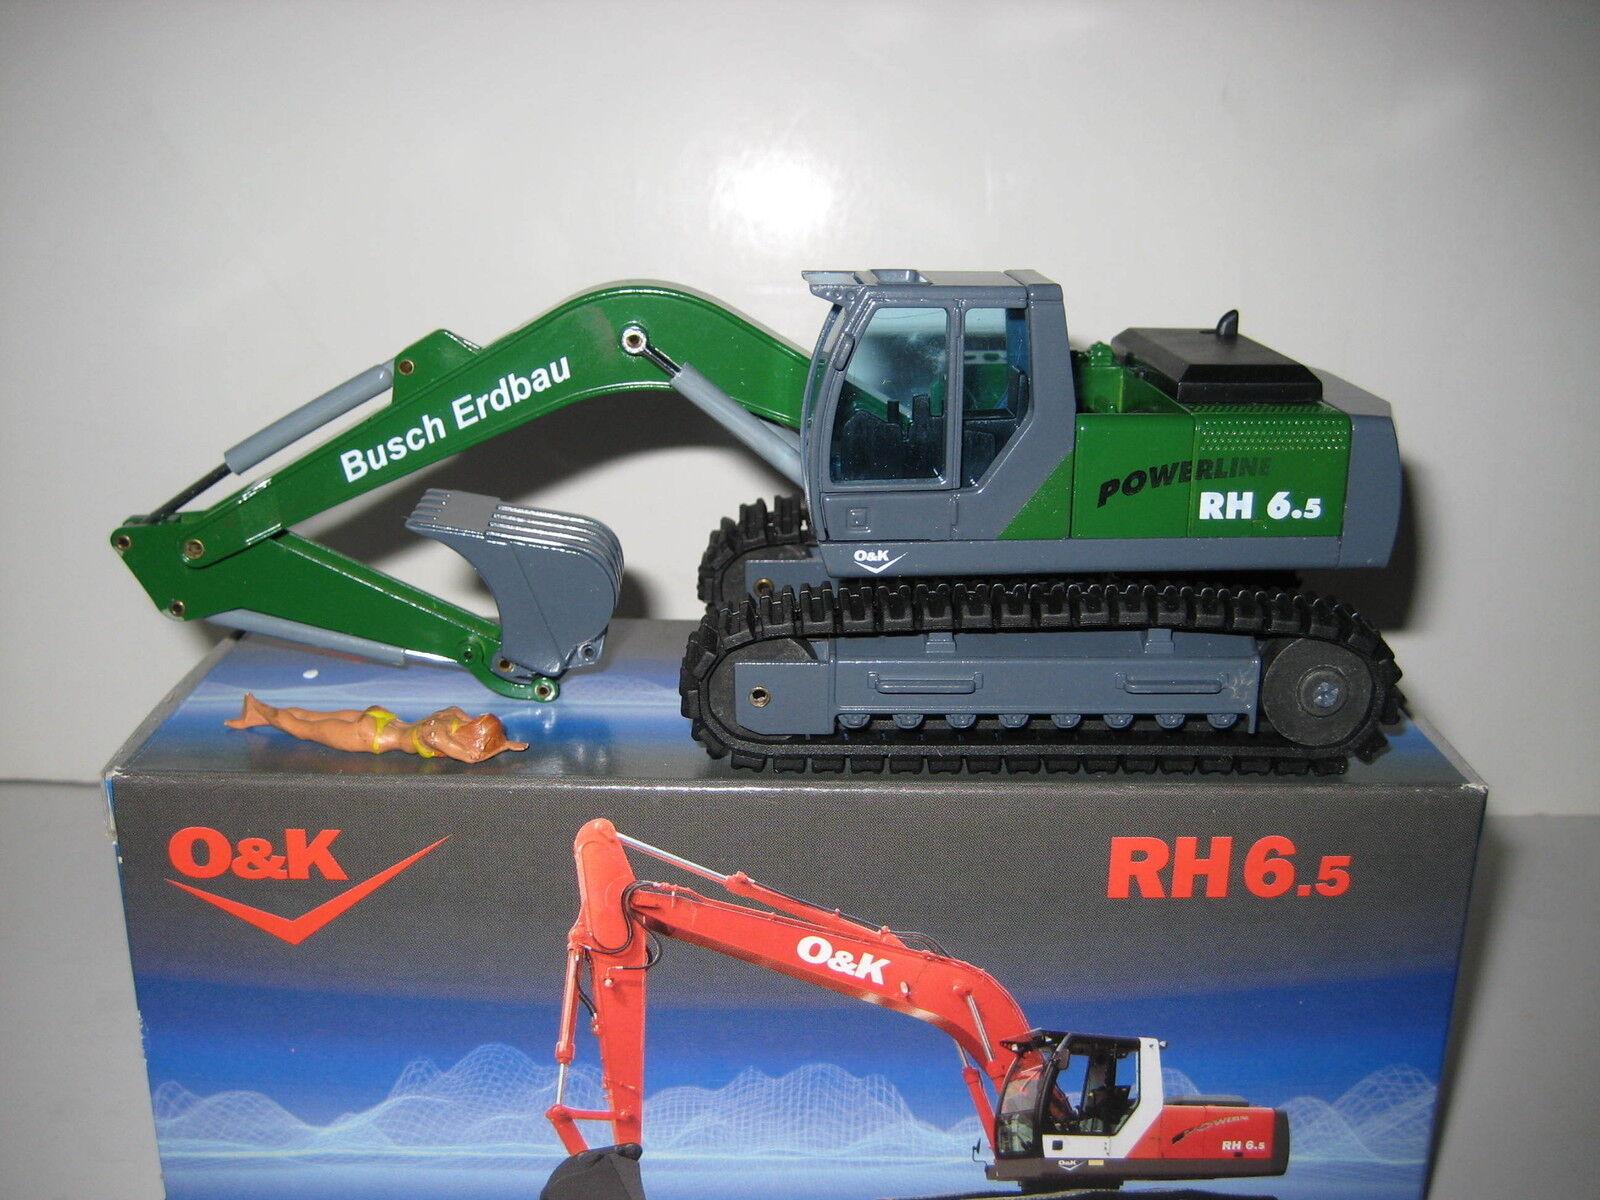 O&k RH 6.5 Excavateurs tieflöffel Busch le domaine du terrassement  469 NZG 1 50 neuf dans sa boîte